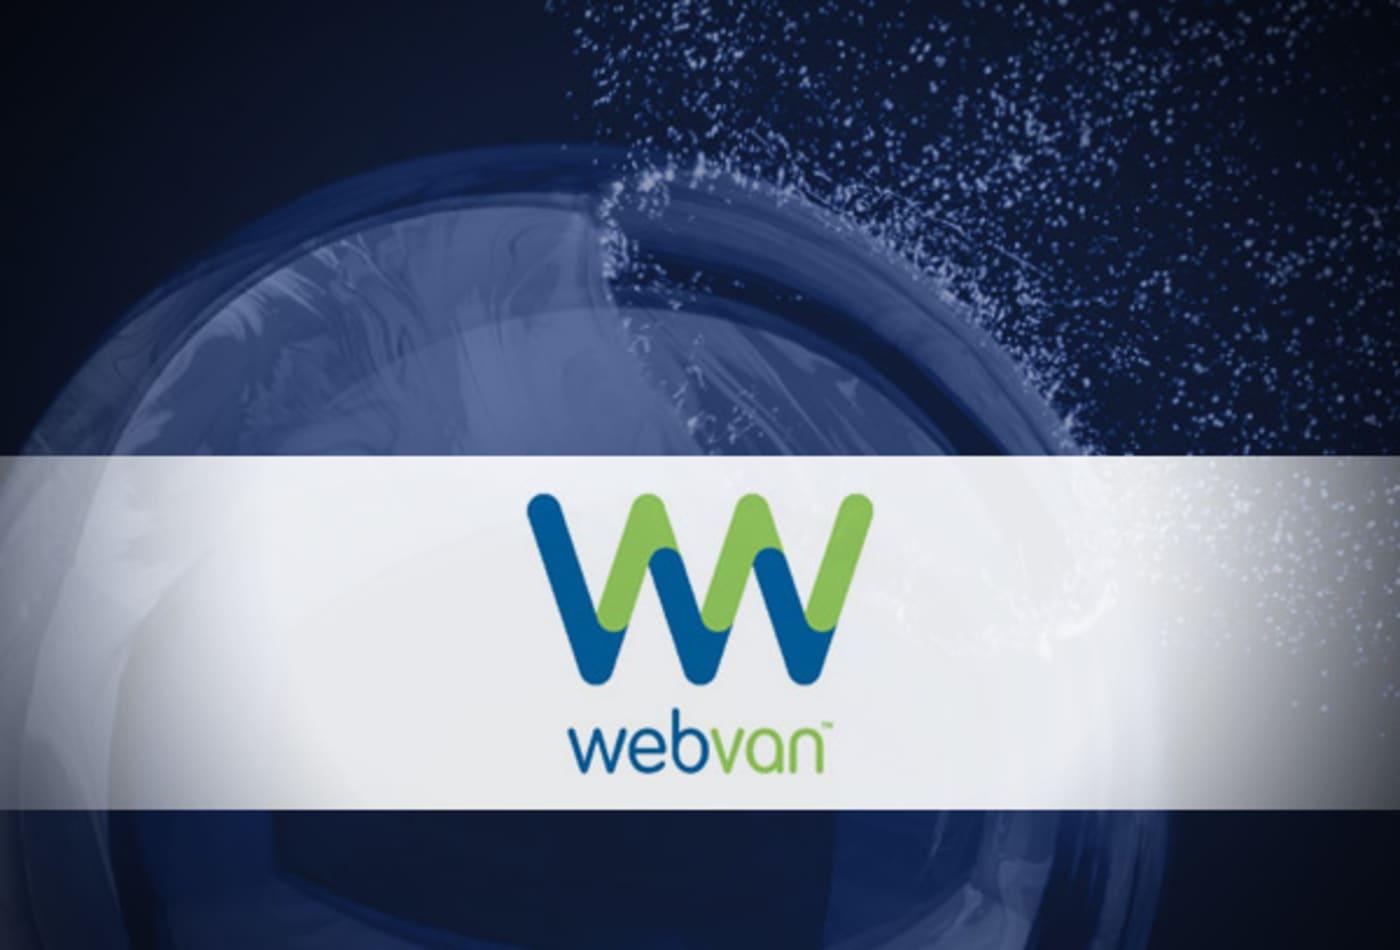 dotcom-busts-webvan-com.jpg